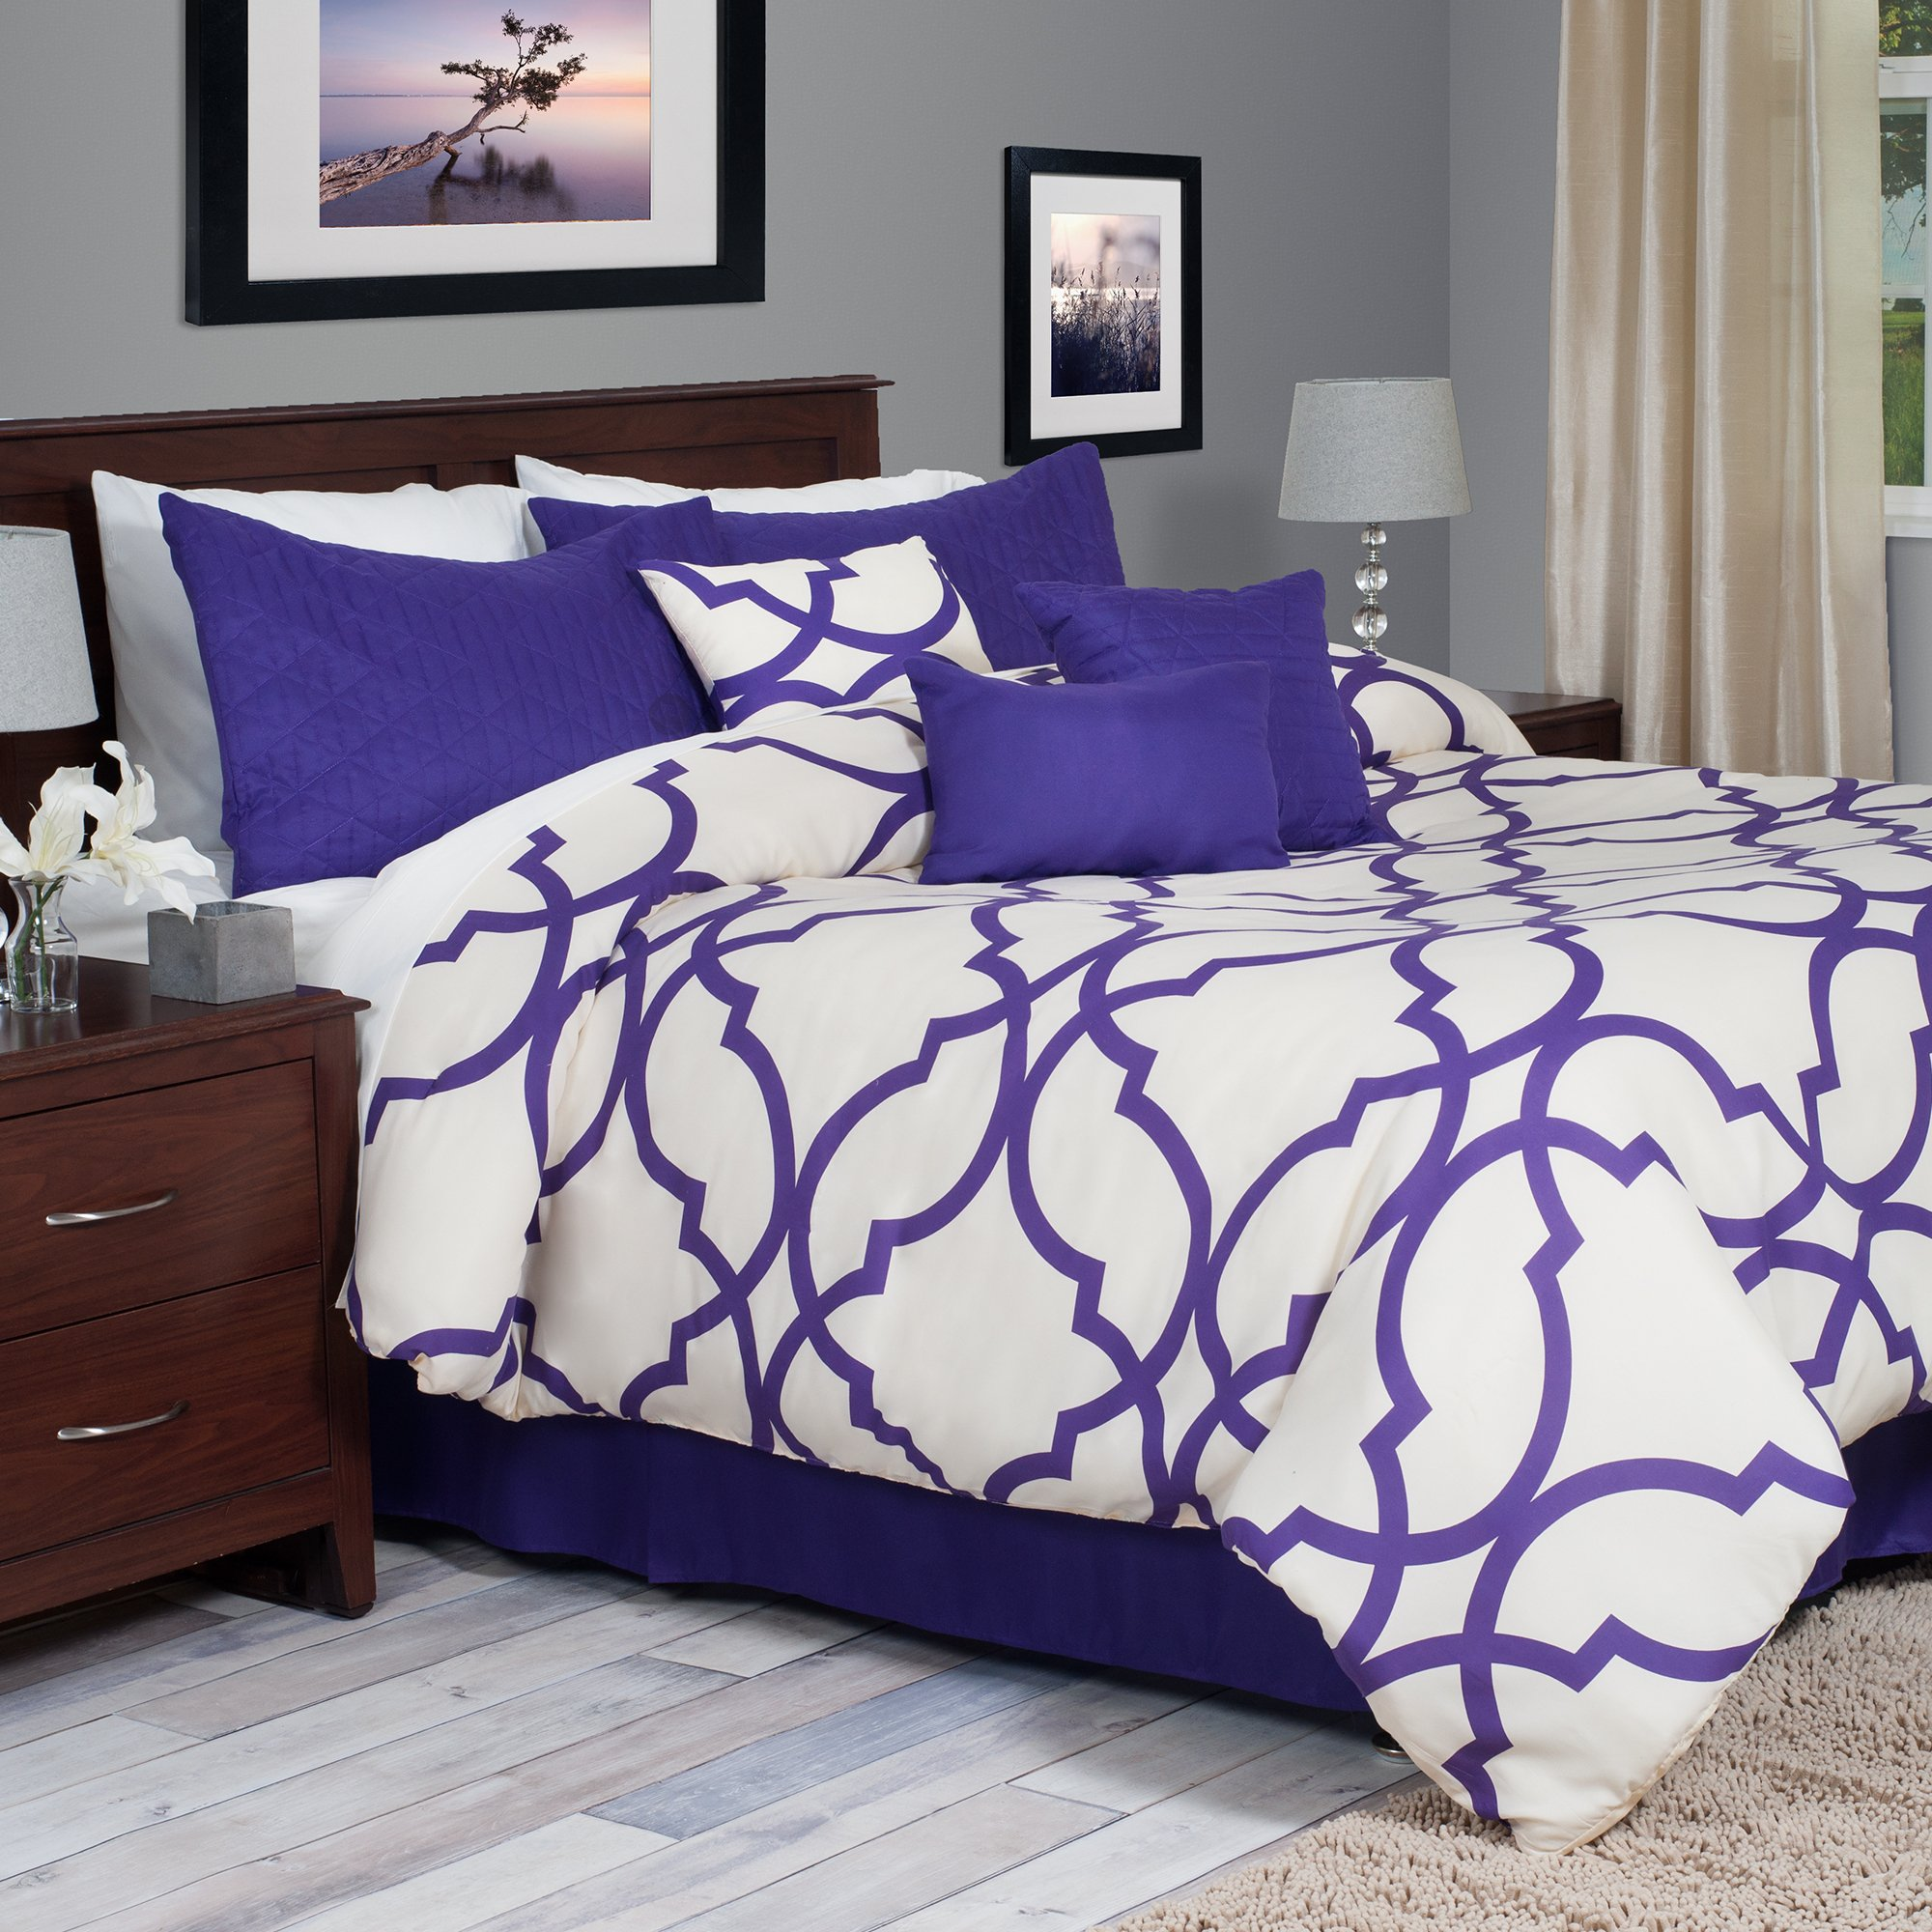 Lavish Home 7-Piece Oversized Trellis Comforter Set, King, Purple